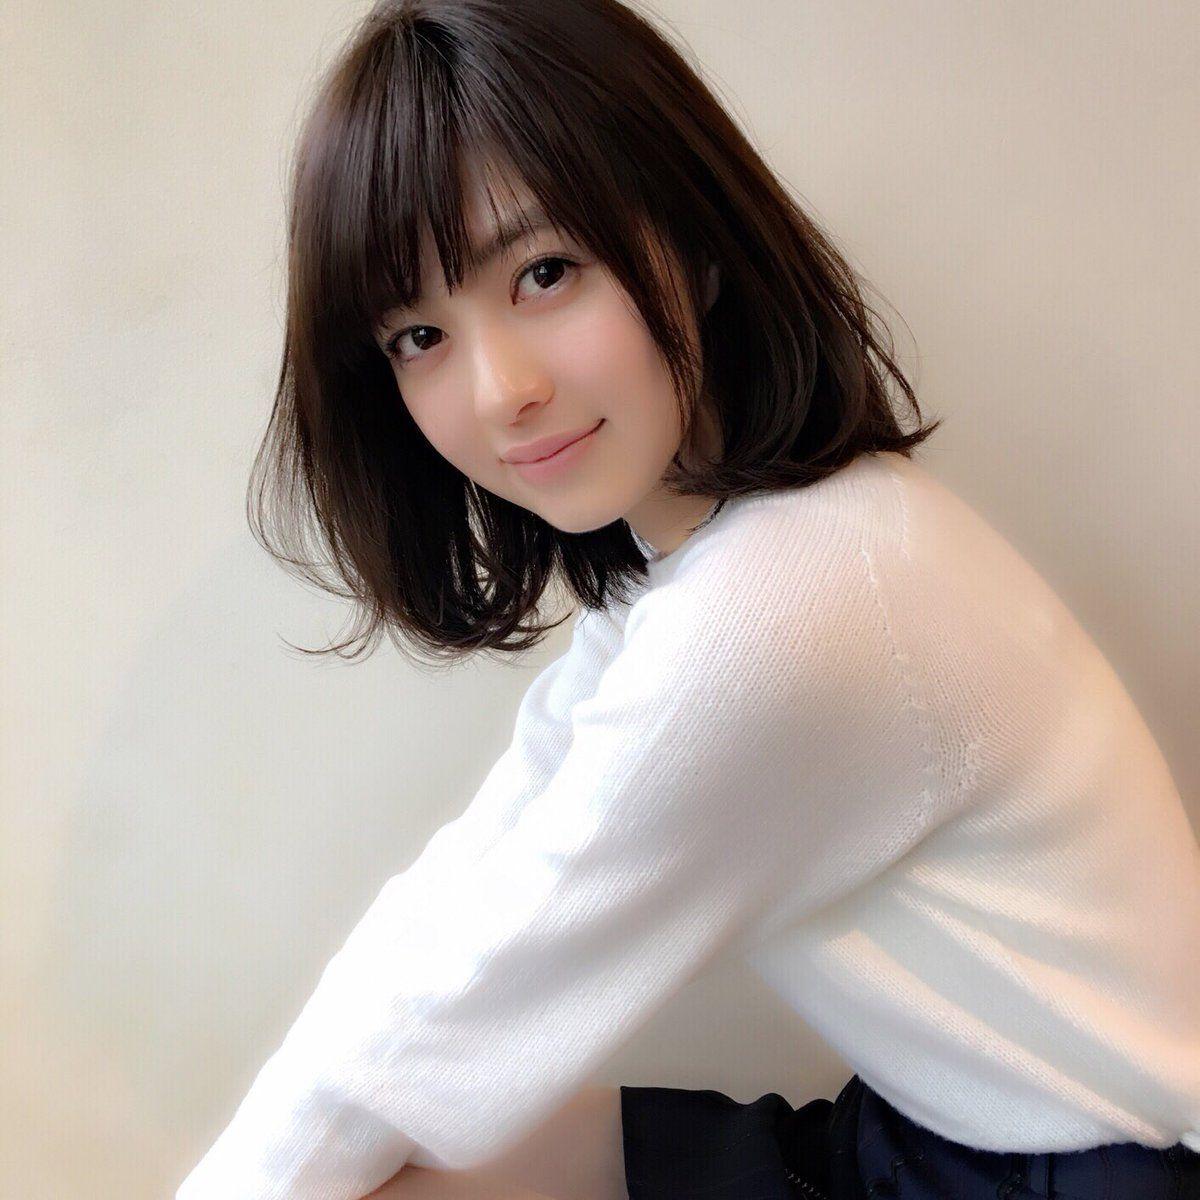 Hatsuka mins blowing japanese hardcore porn play